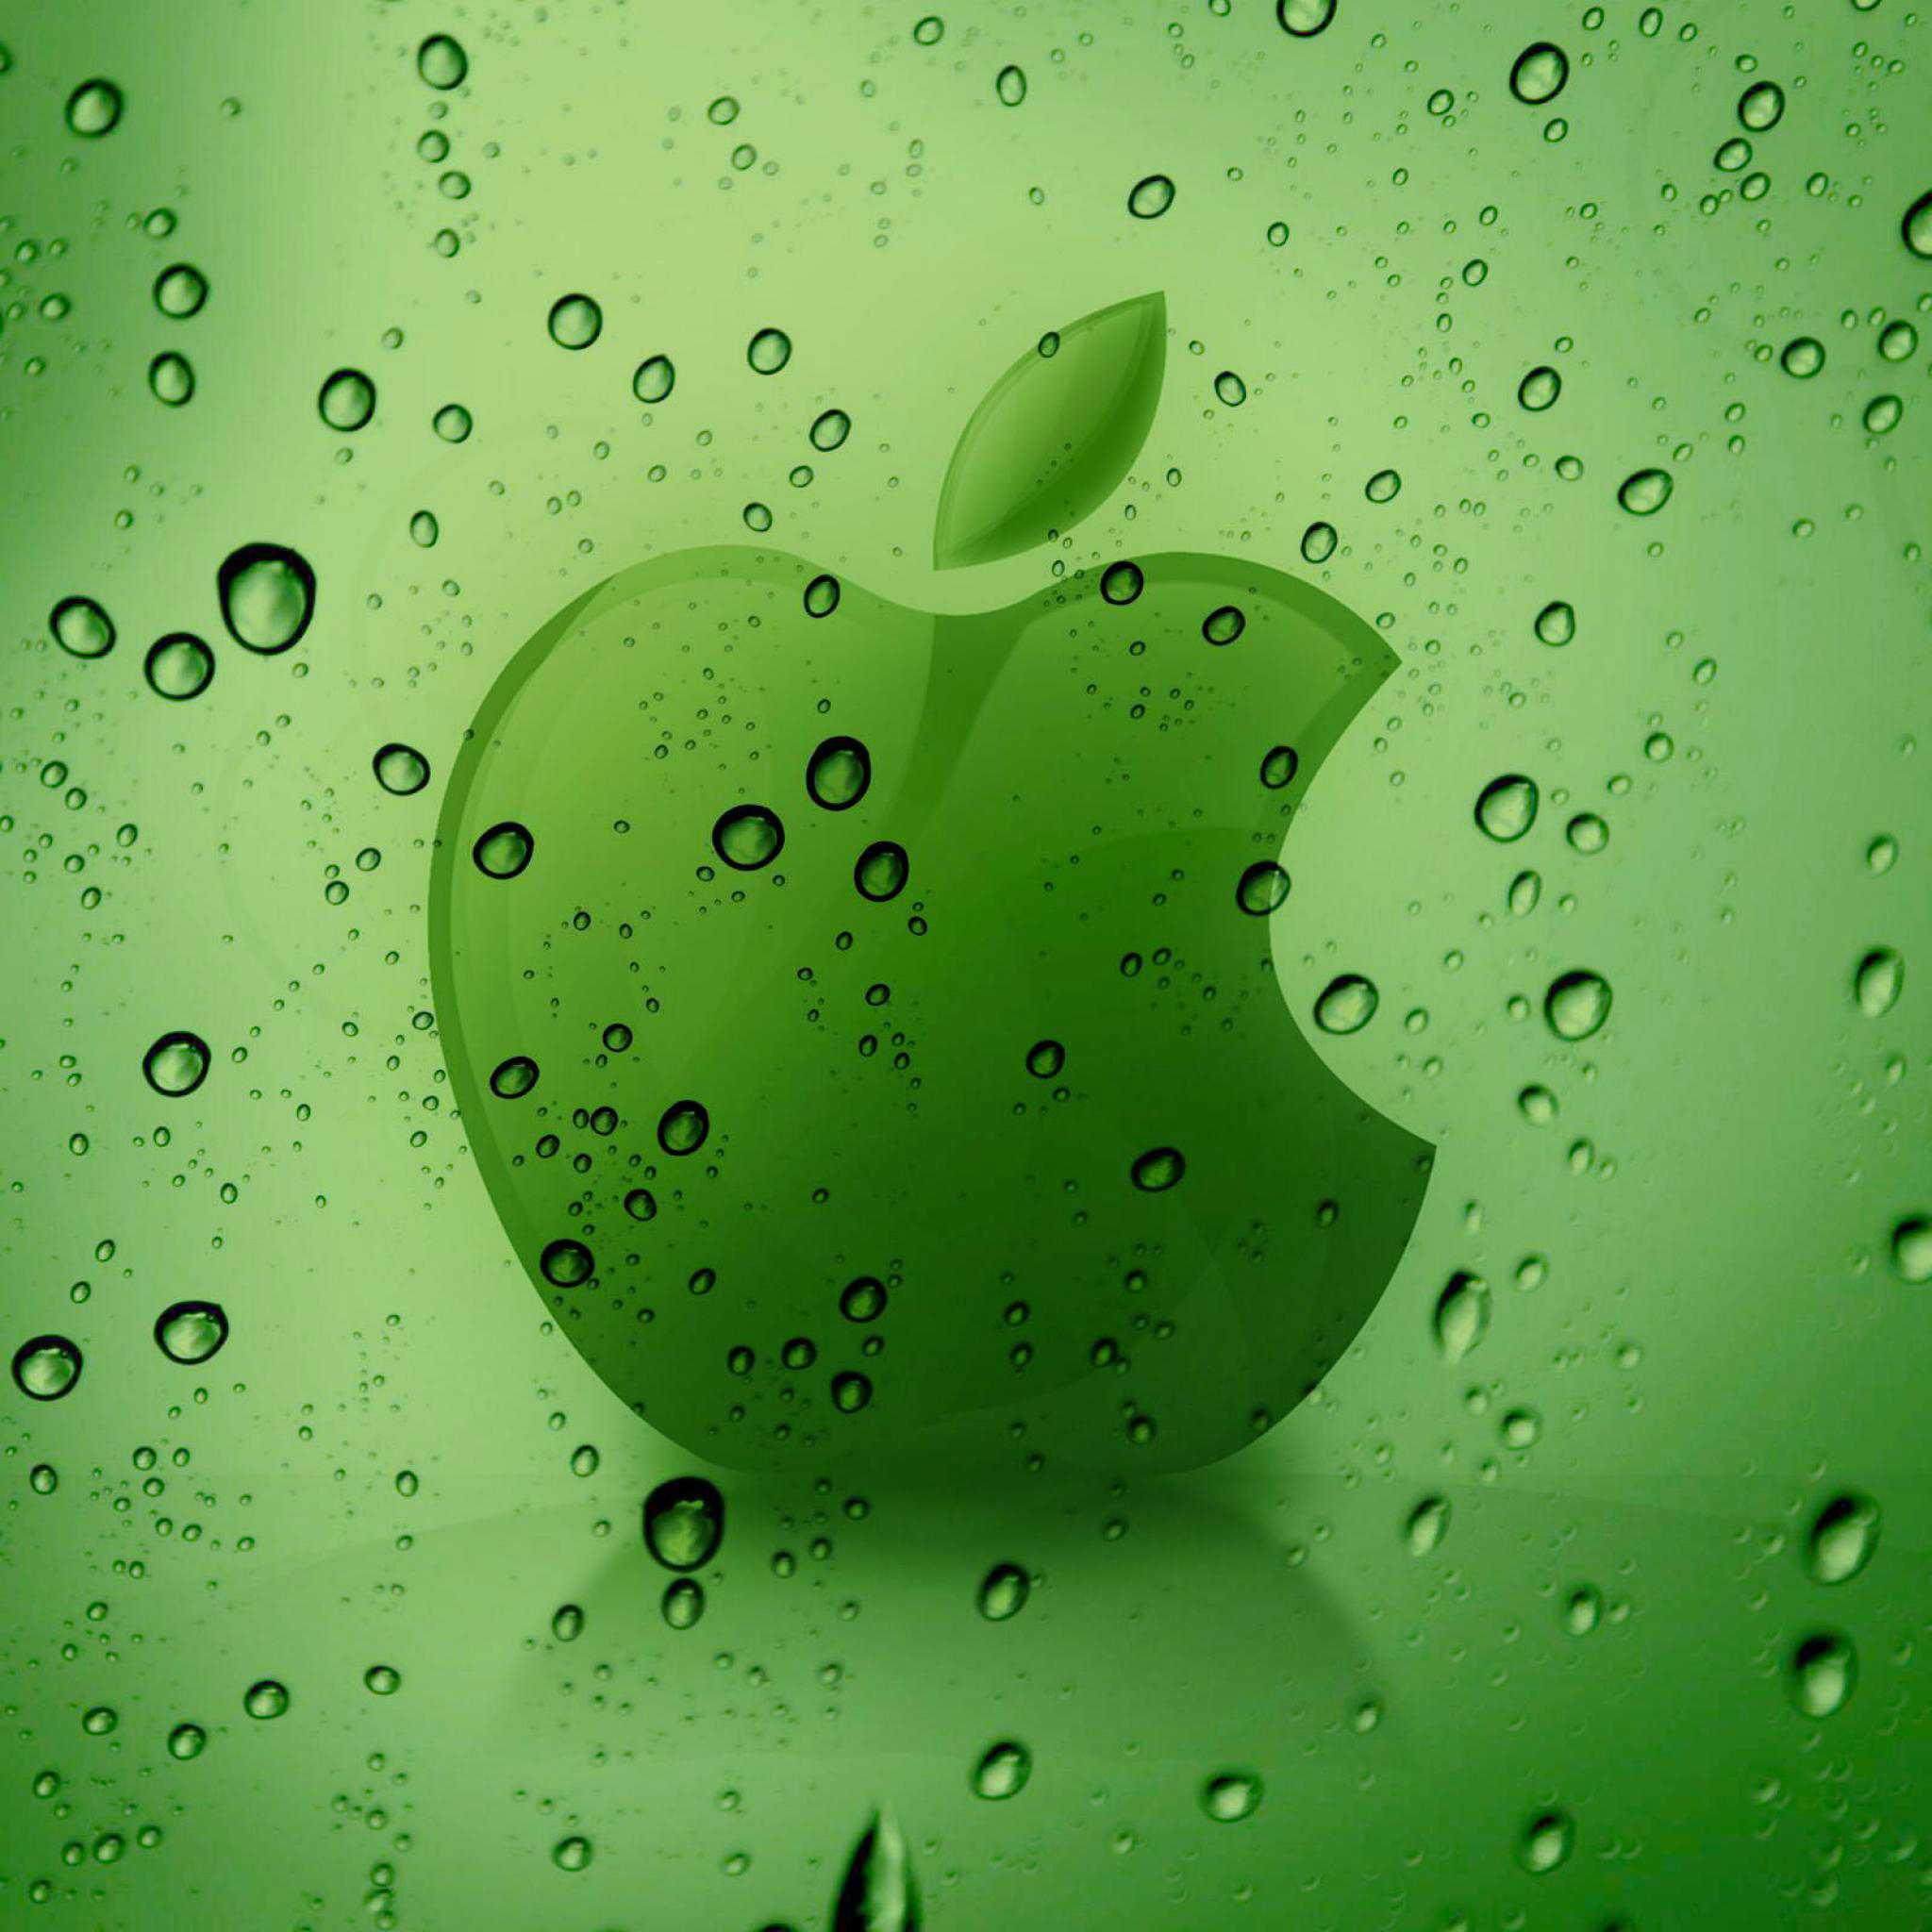 Green Apple Logo 3Wallpaper iPad Retina Green Apple Logo   iPad Retina